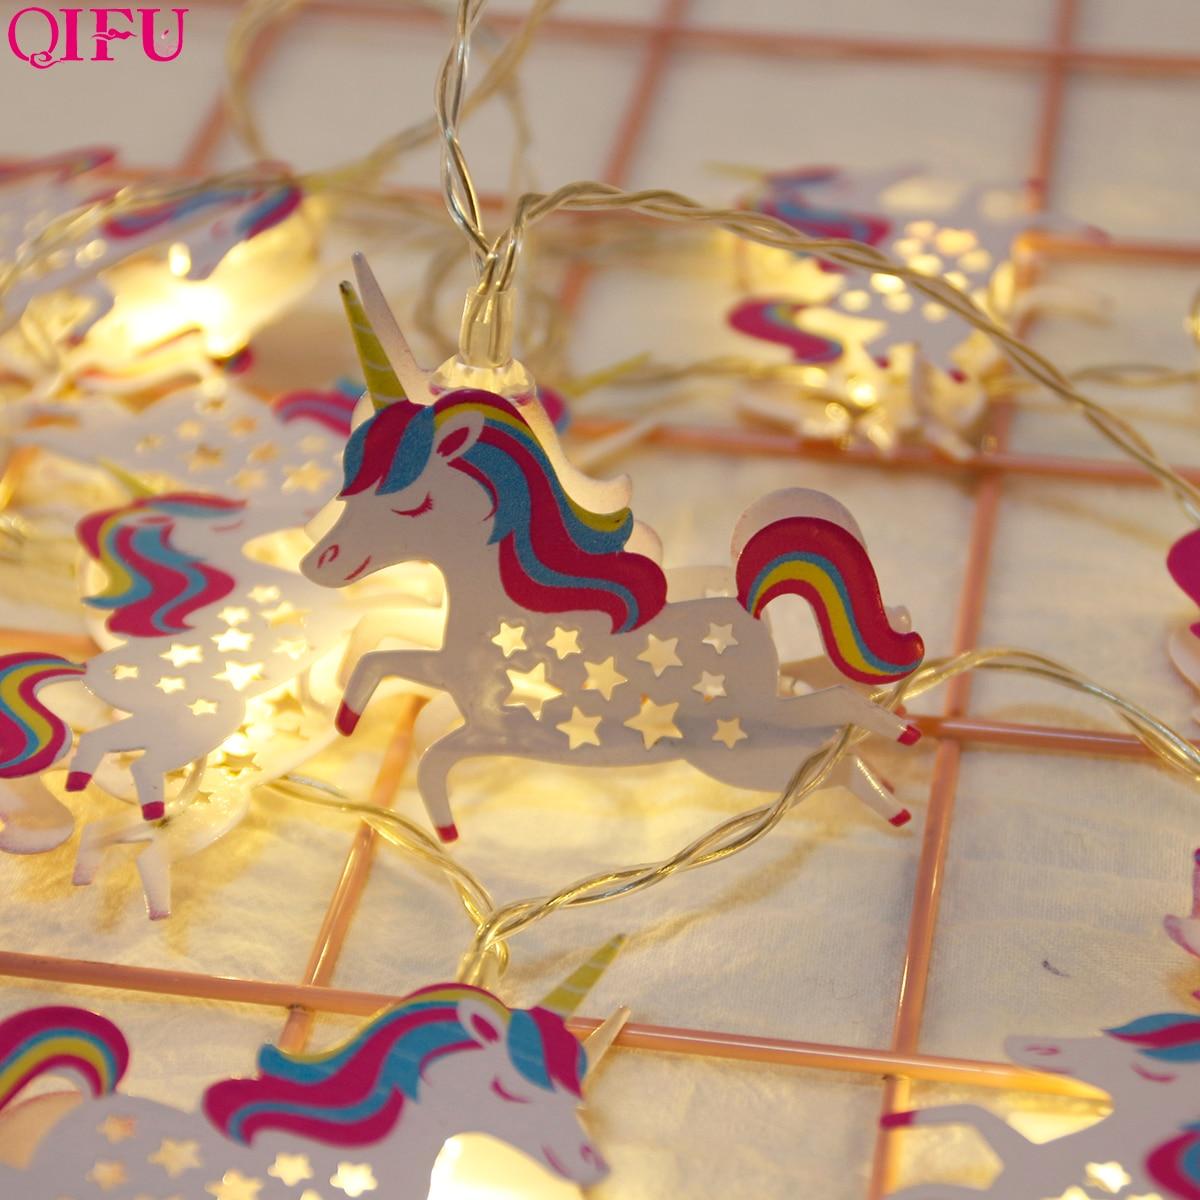 QIFU 10LED Unicorn Light Happy Birthday Party Decorations Warm Colourful Supplies Decor